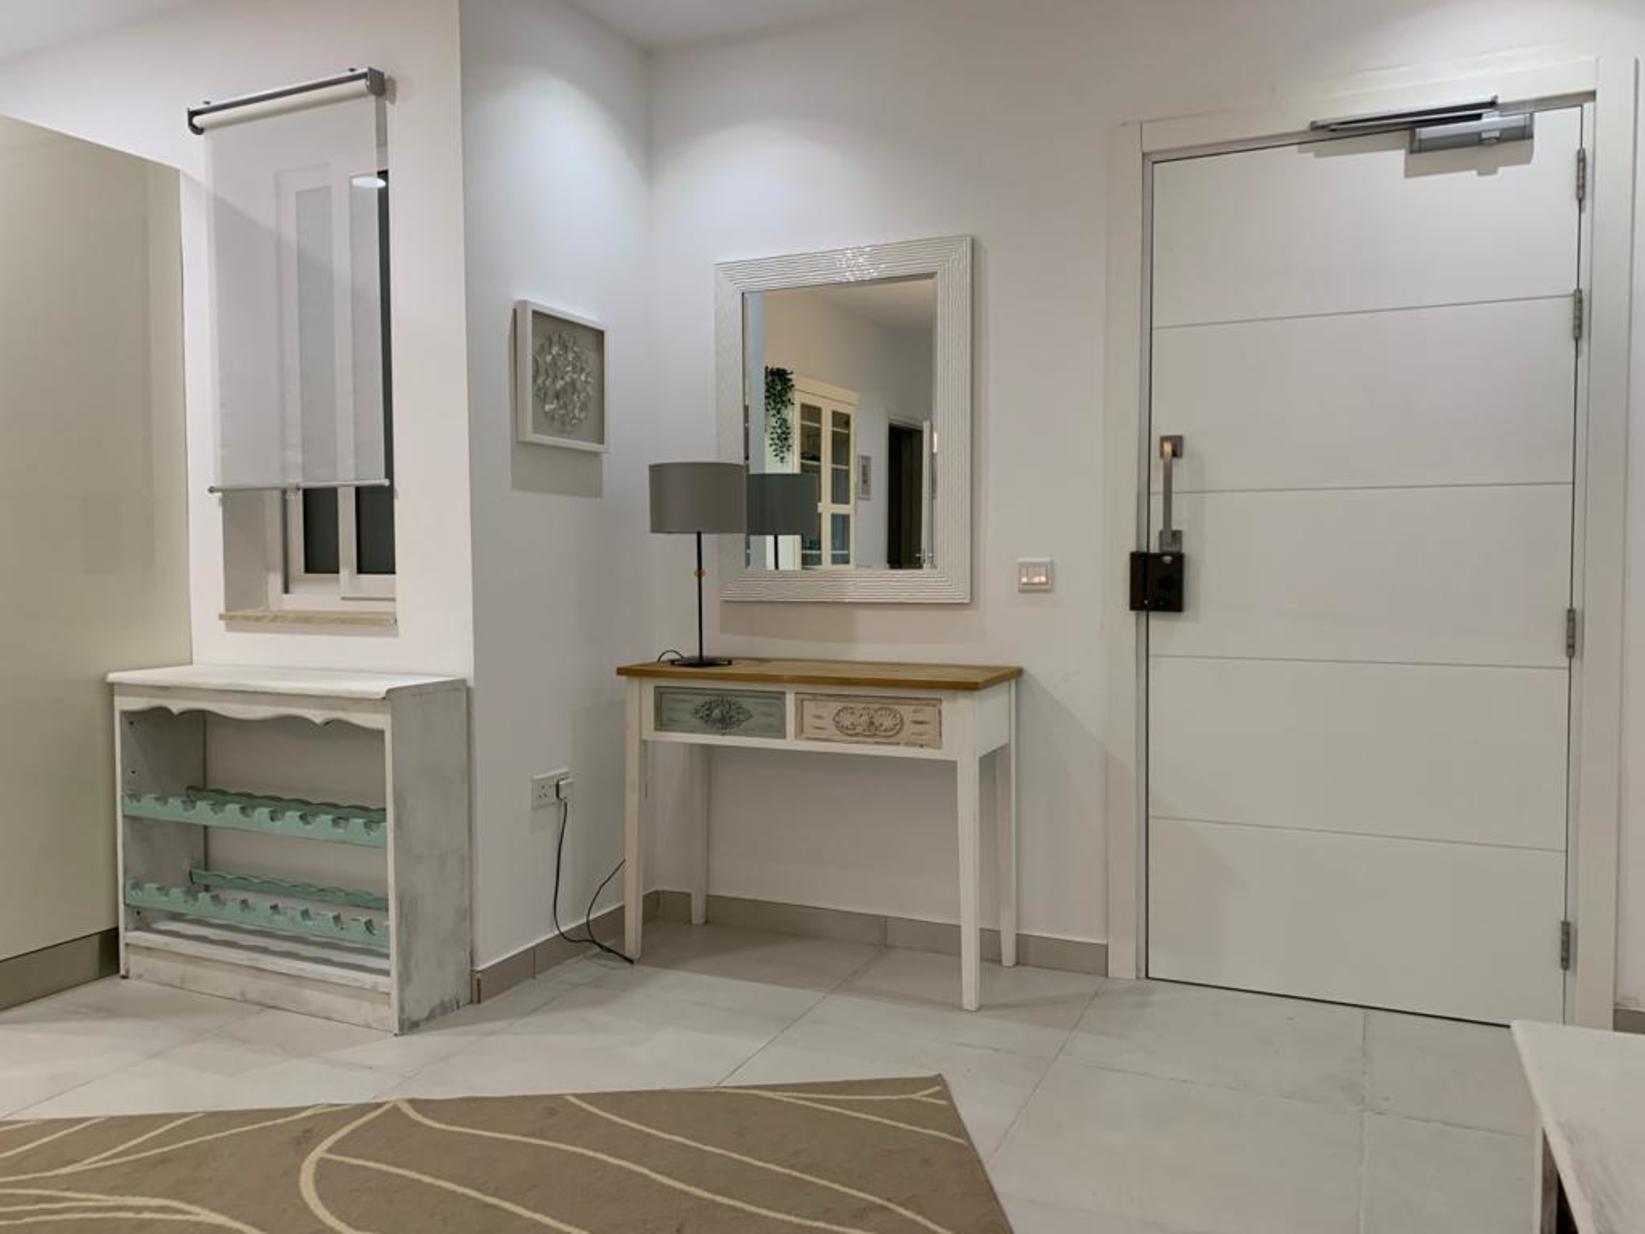 1 bed Apartment For Rent in Sliema, Sliema - thumb 12